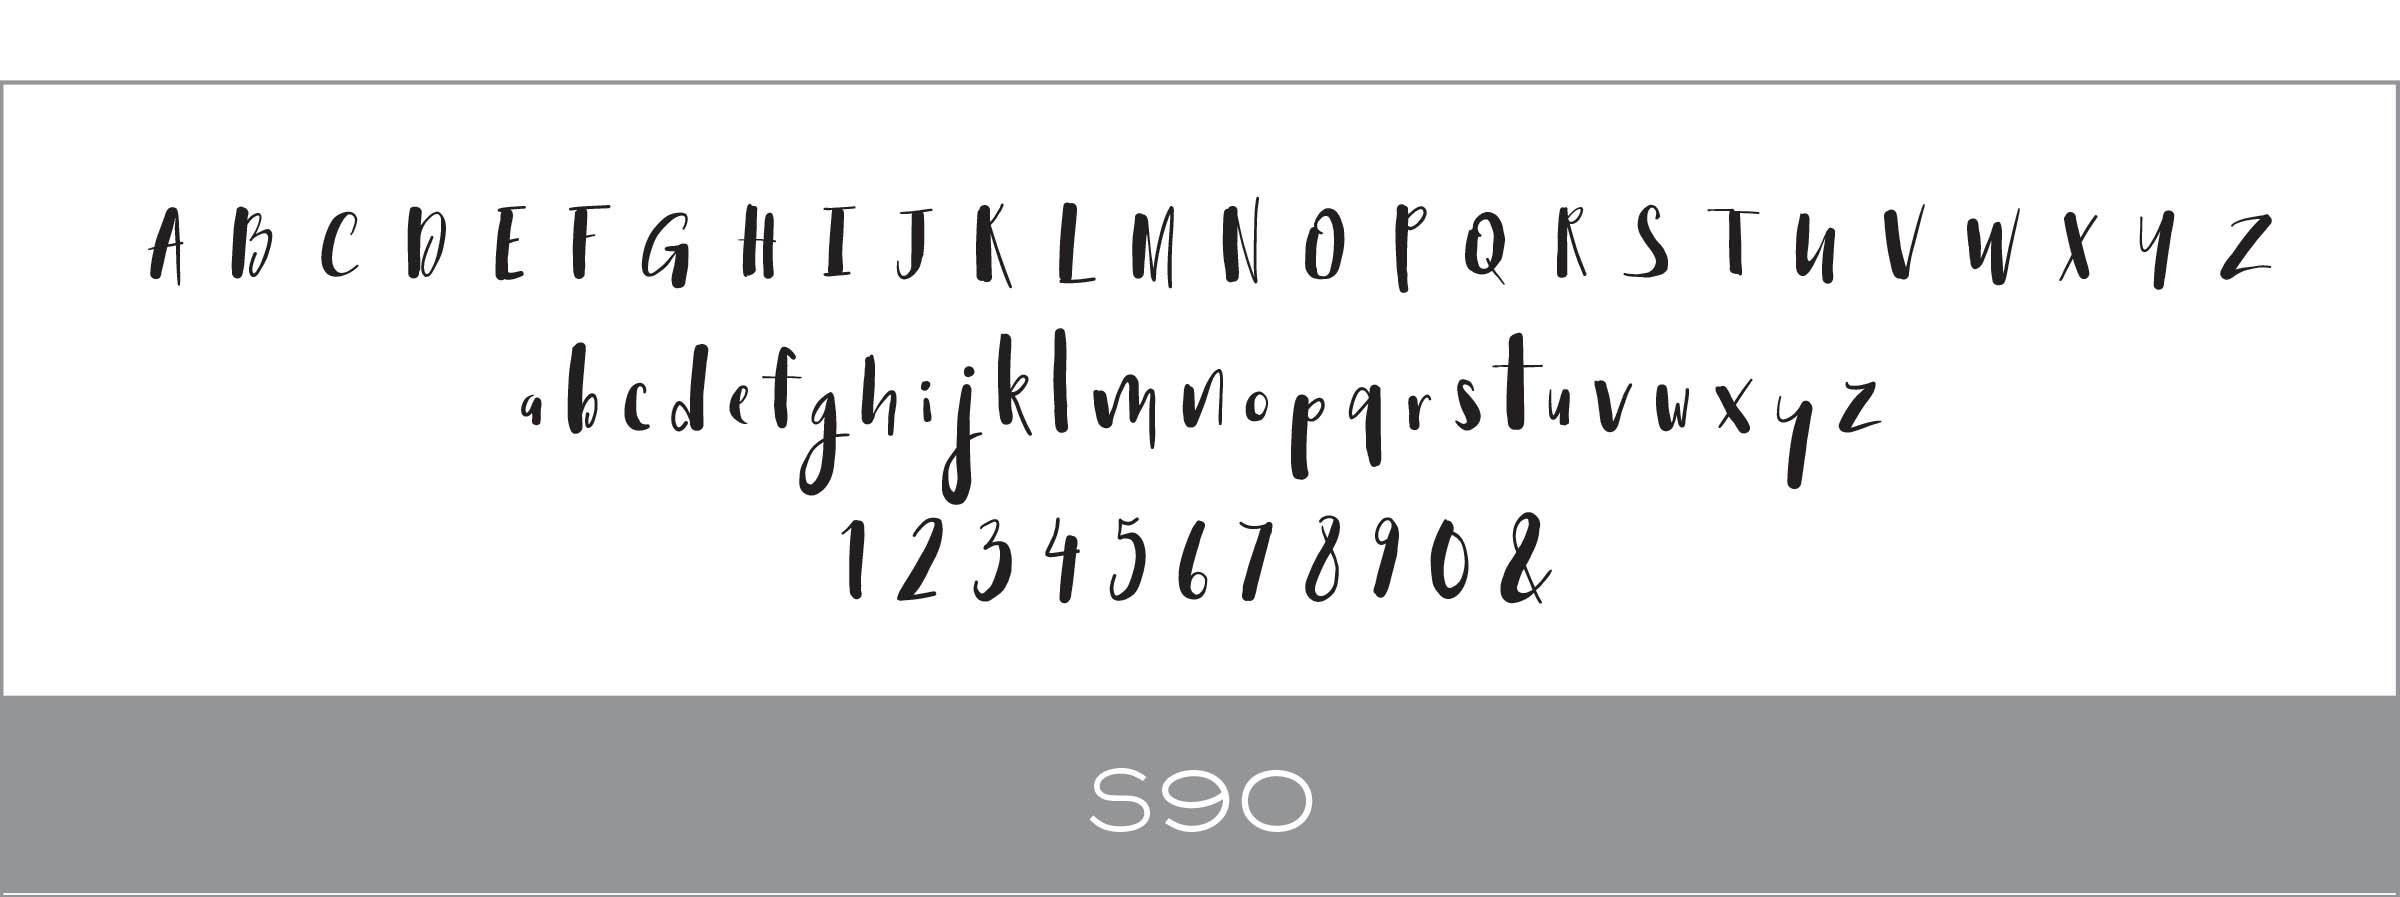 S90_Haute_Papier_Font.jpg